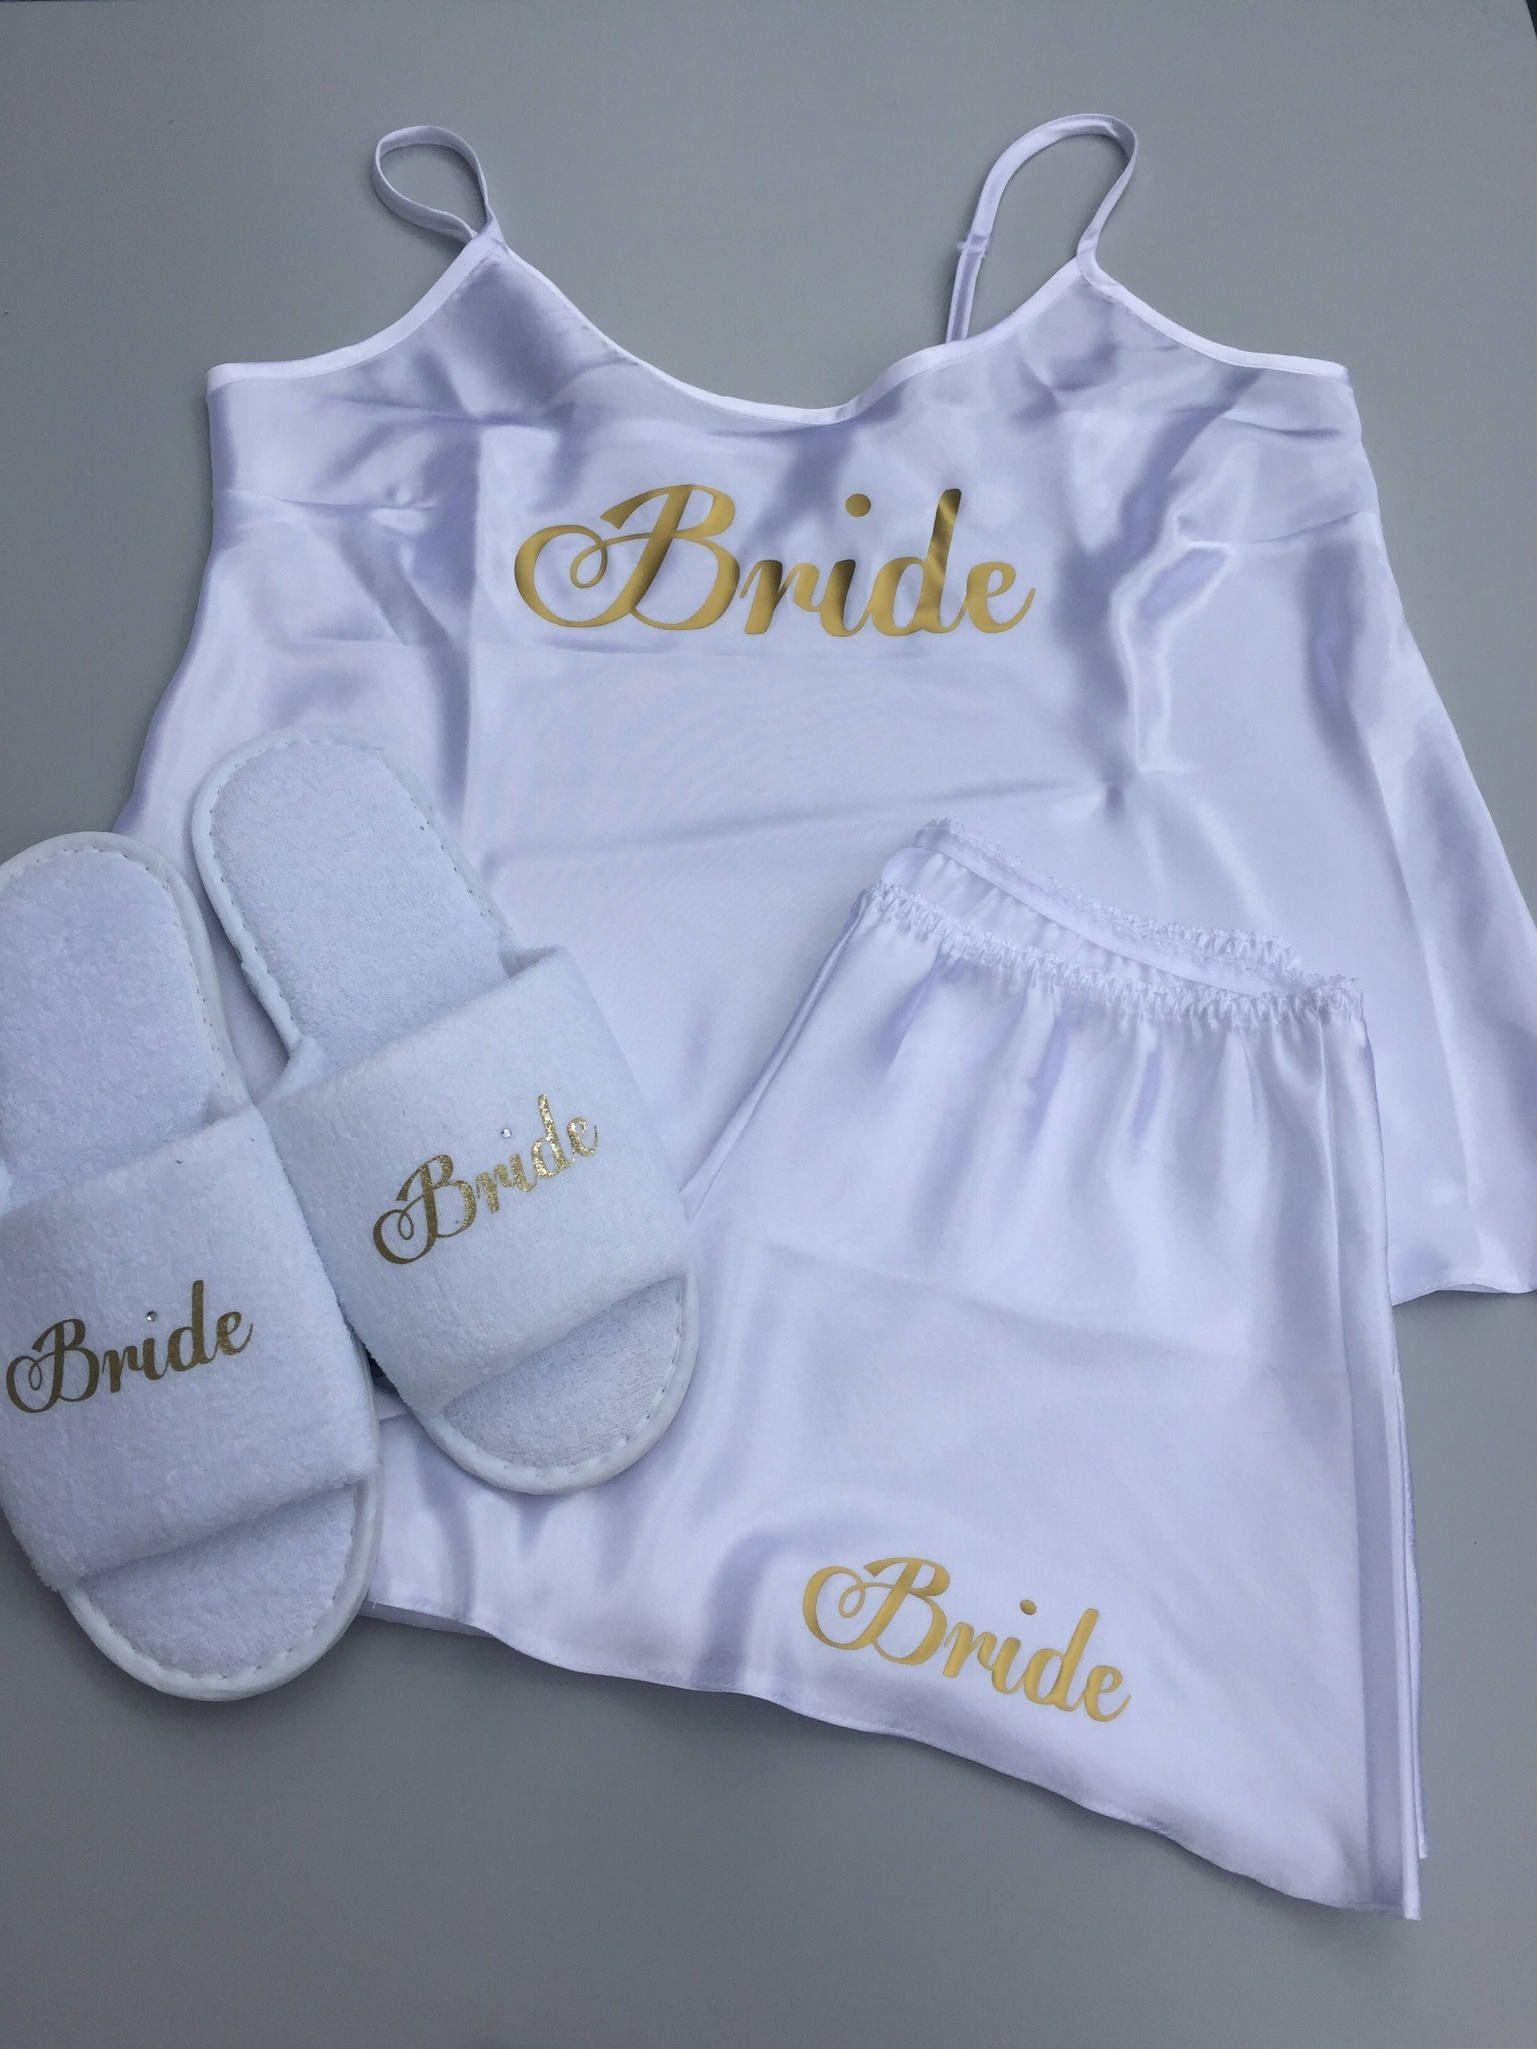 Bride Cami Set Bride Pajamas Wedding Pajamas Bride Gift Satin